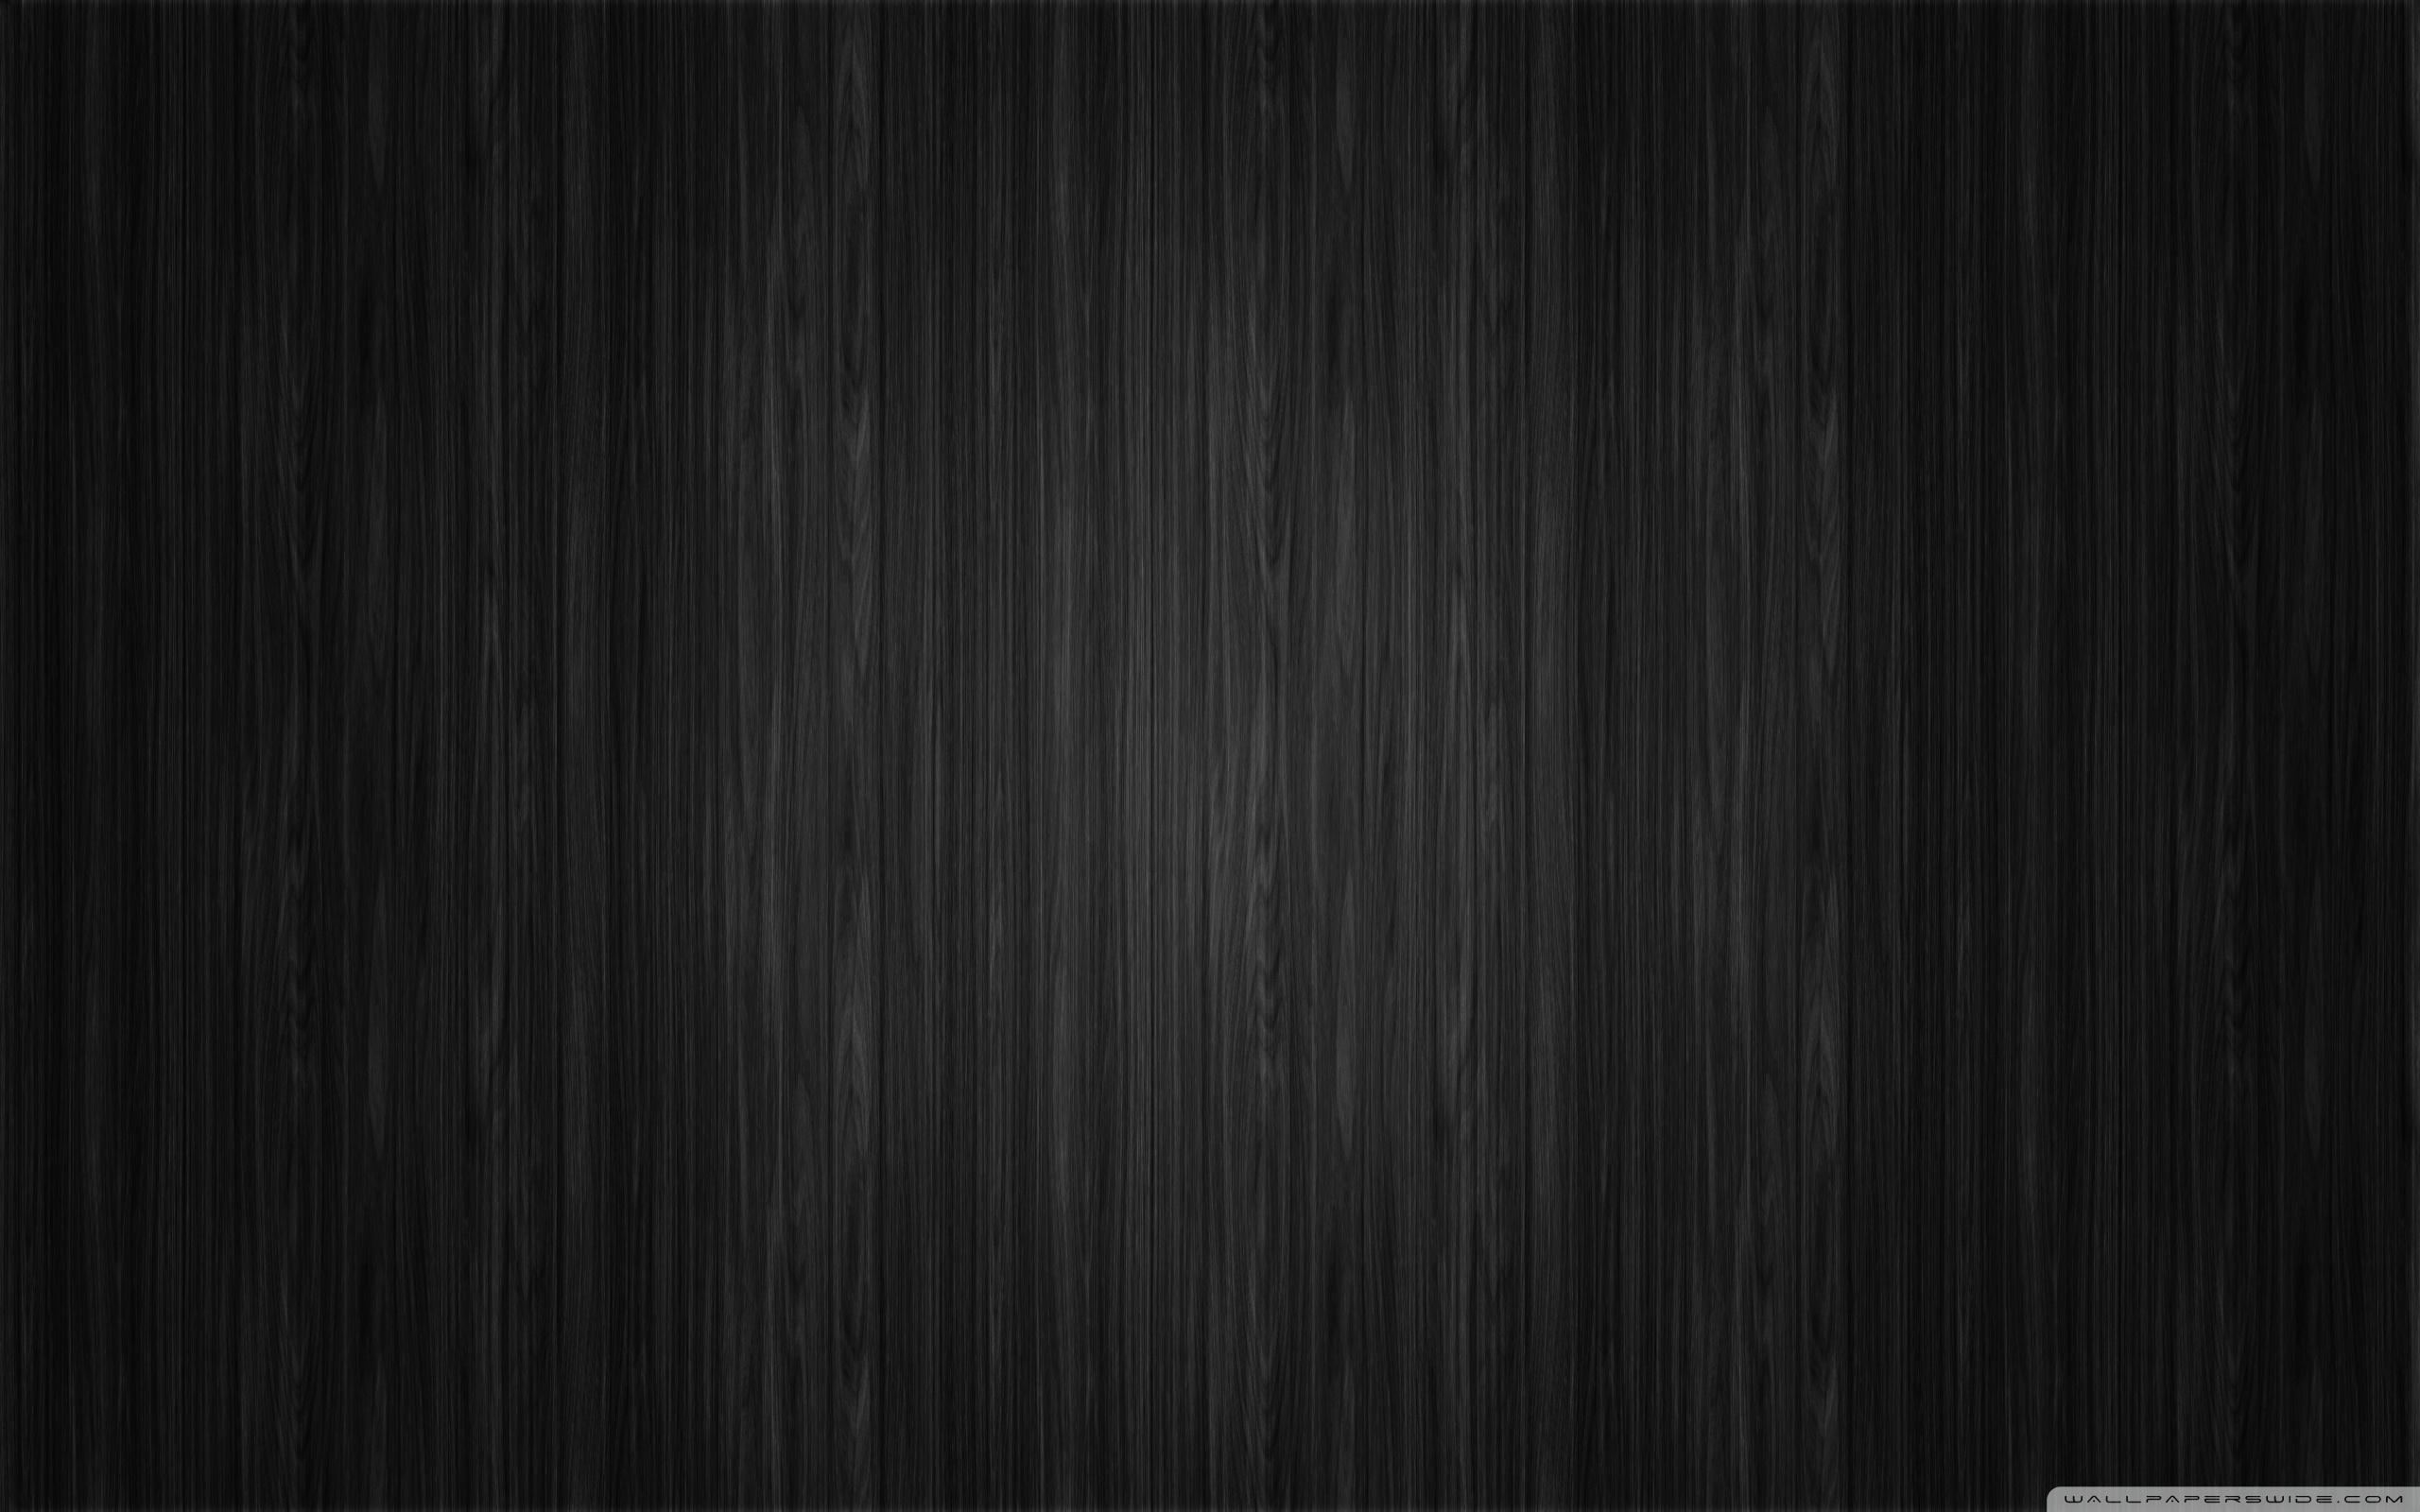 Black background wood clean 4k hd desktop wallpaper for 4k for 1234 get on the dance floor hd video download